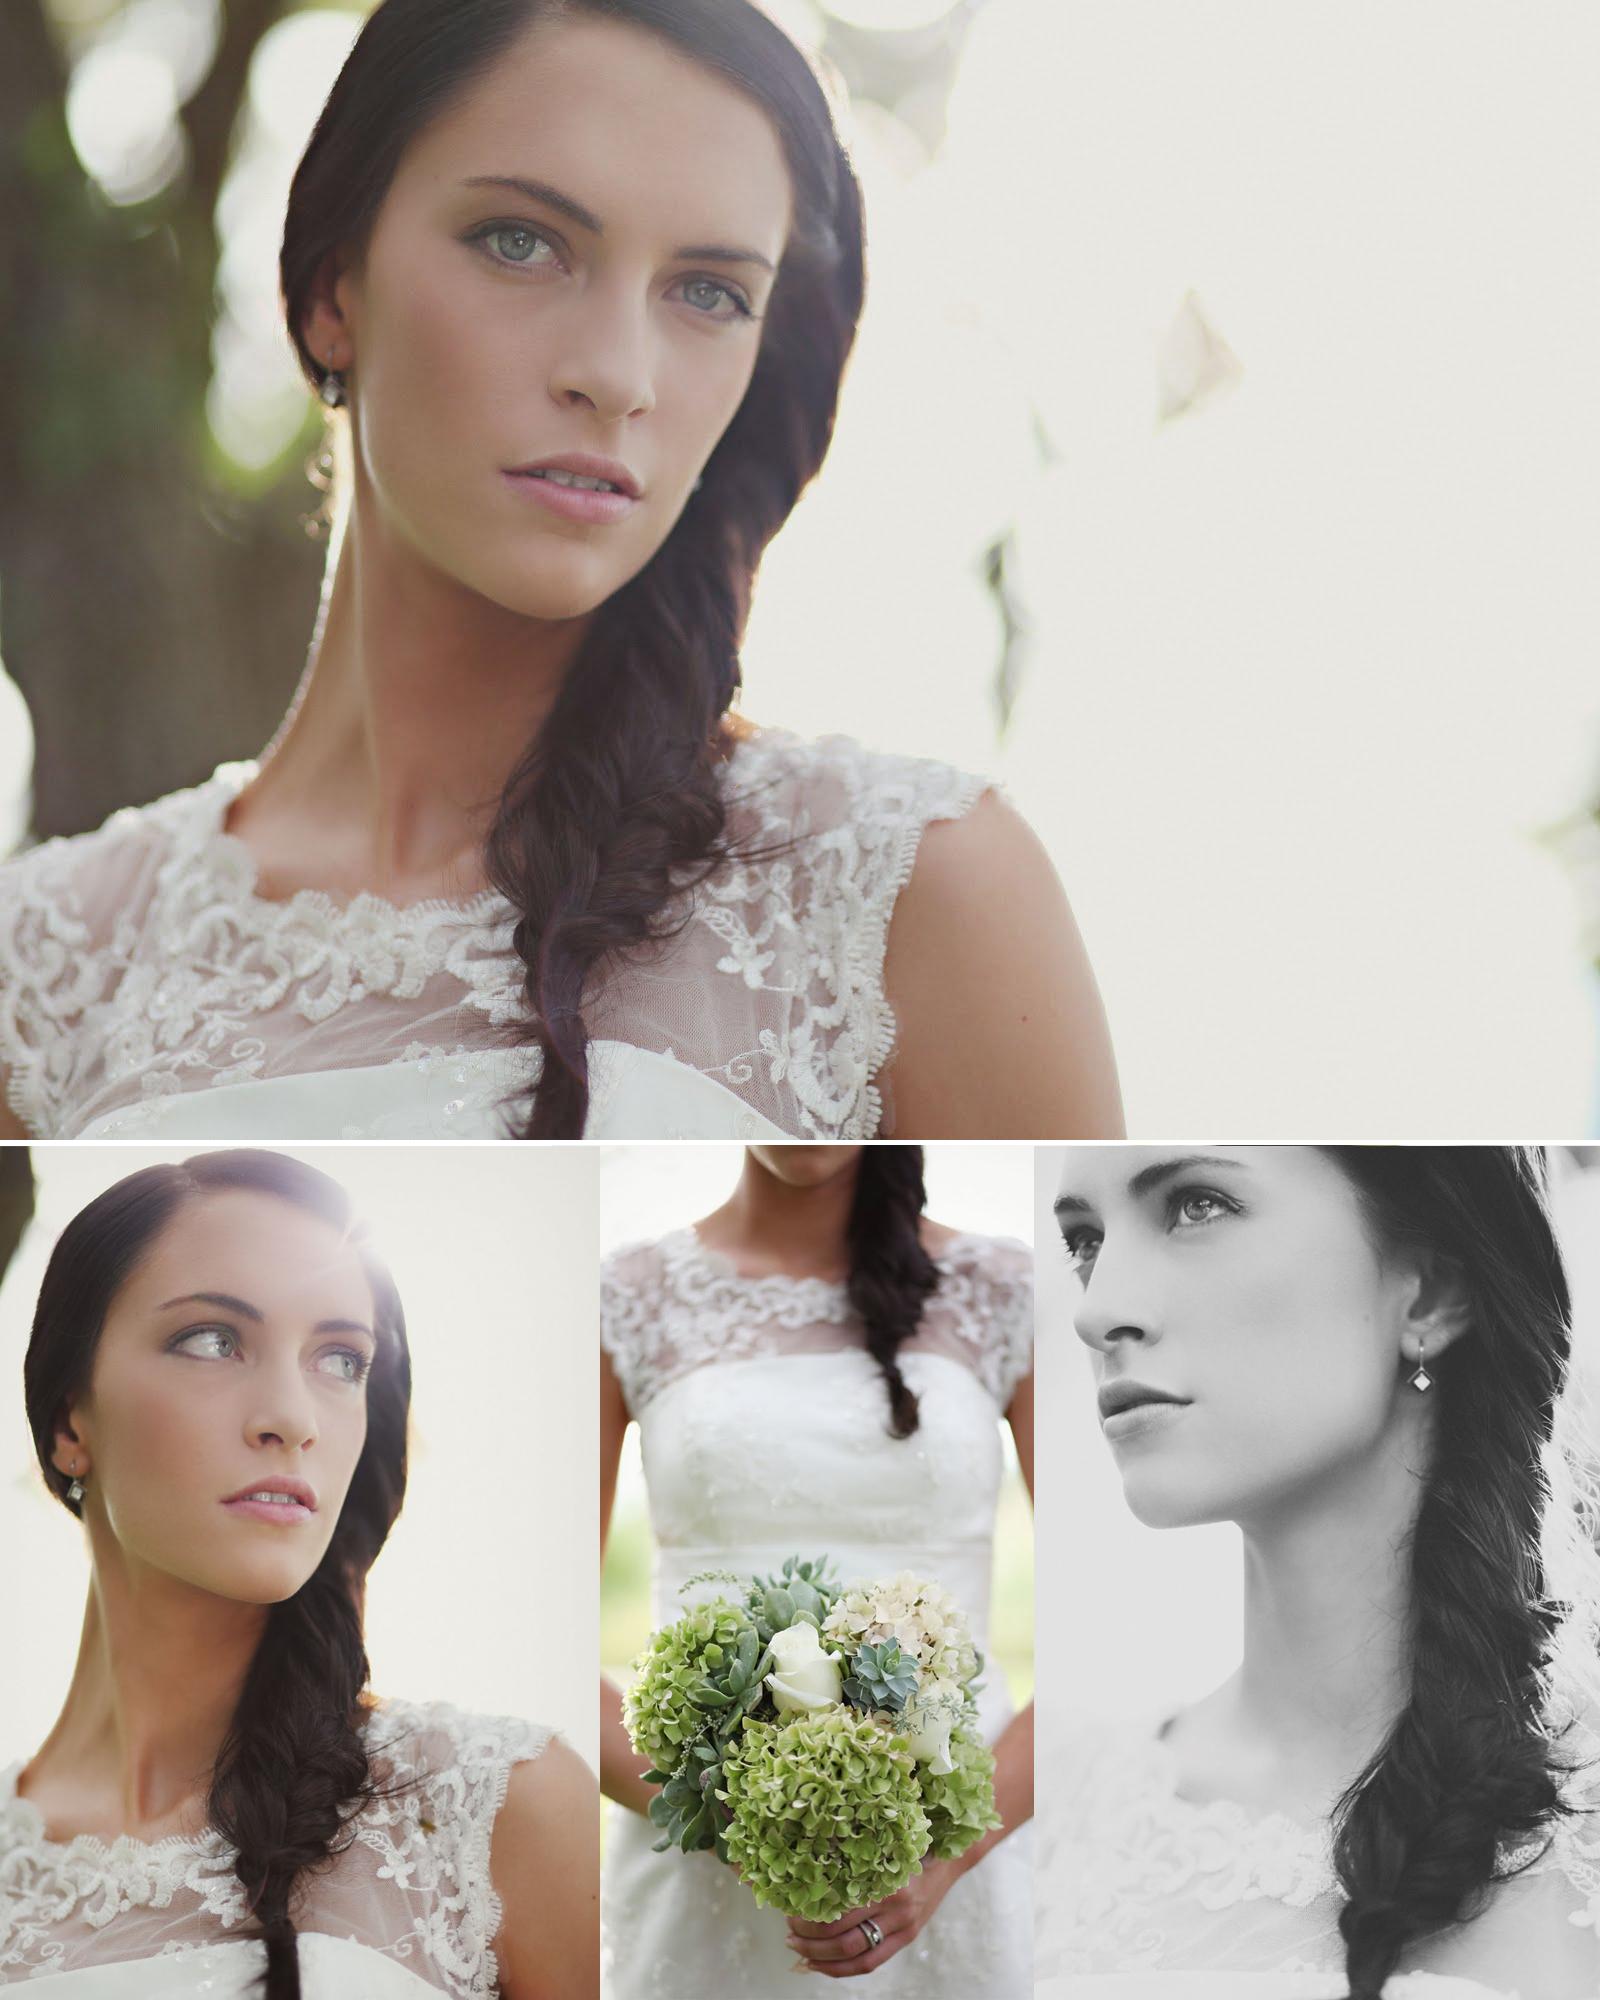 Bohemian Wedding Hairstyles - hairstyles with bangs